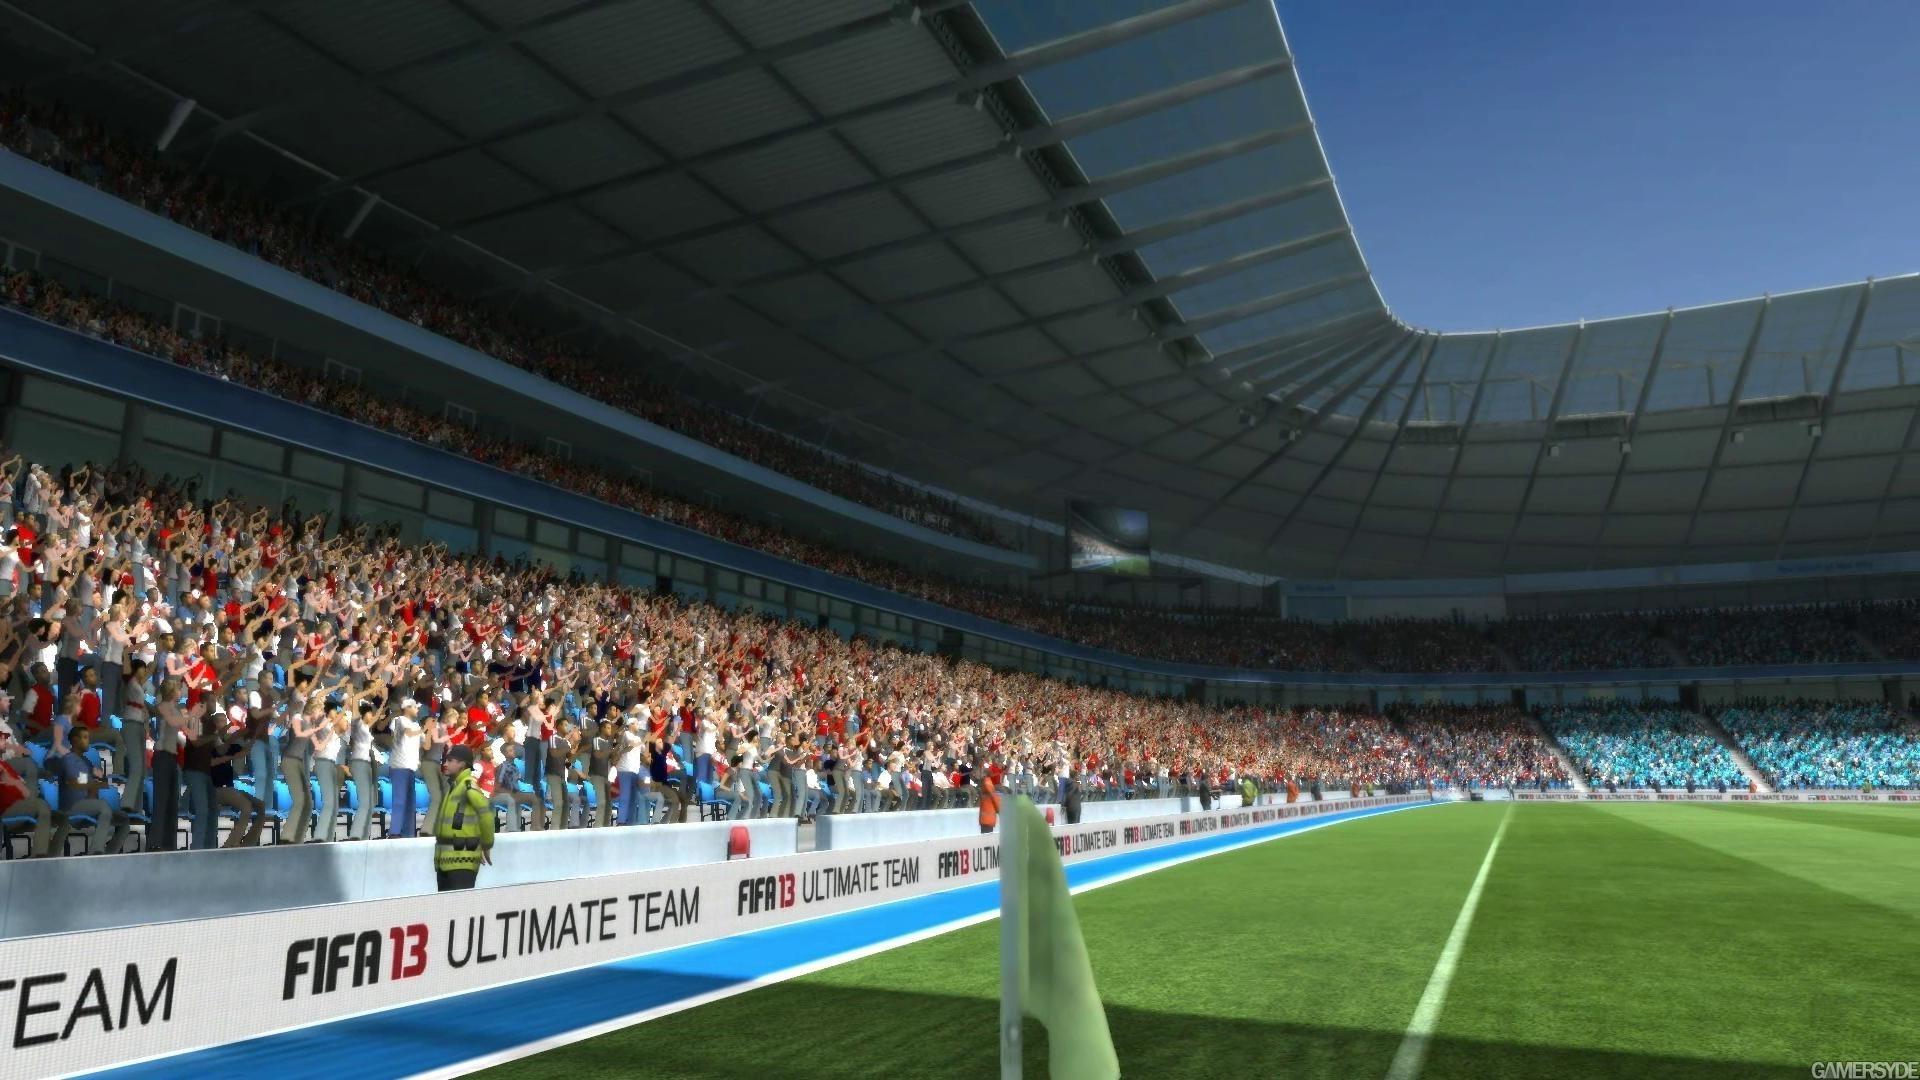 image fifa 13 20261 2509 0008 تصاویر جدید از بازی FIFA 13